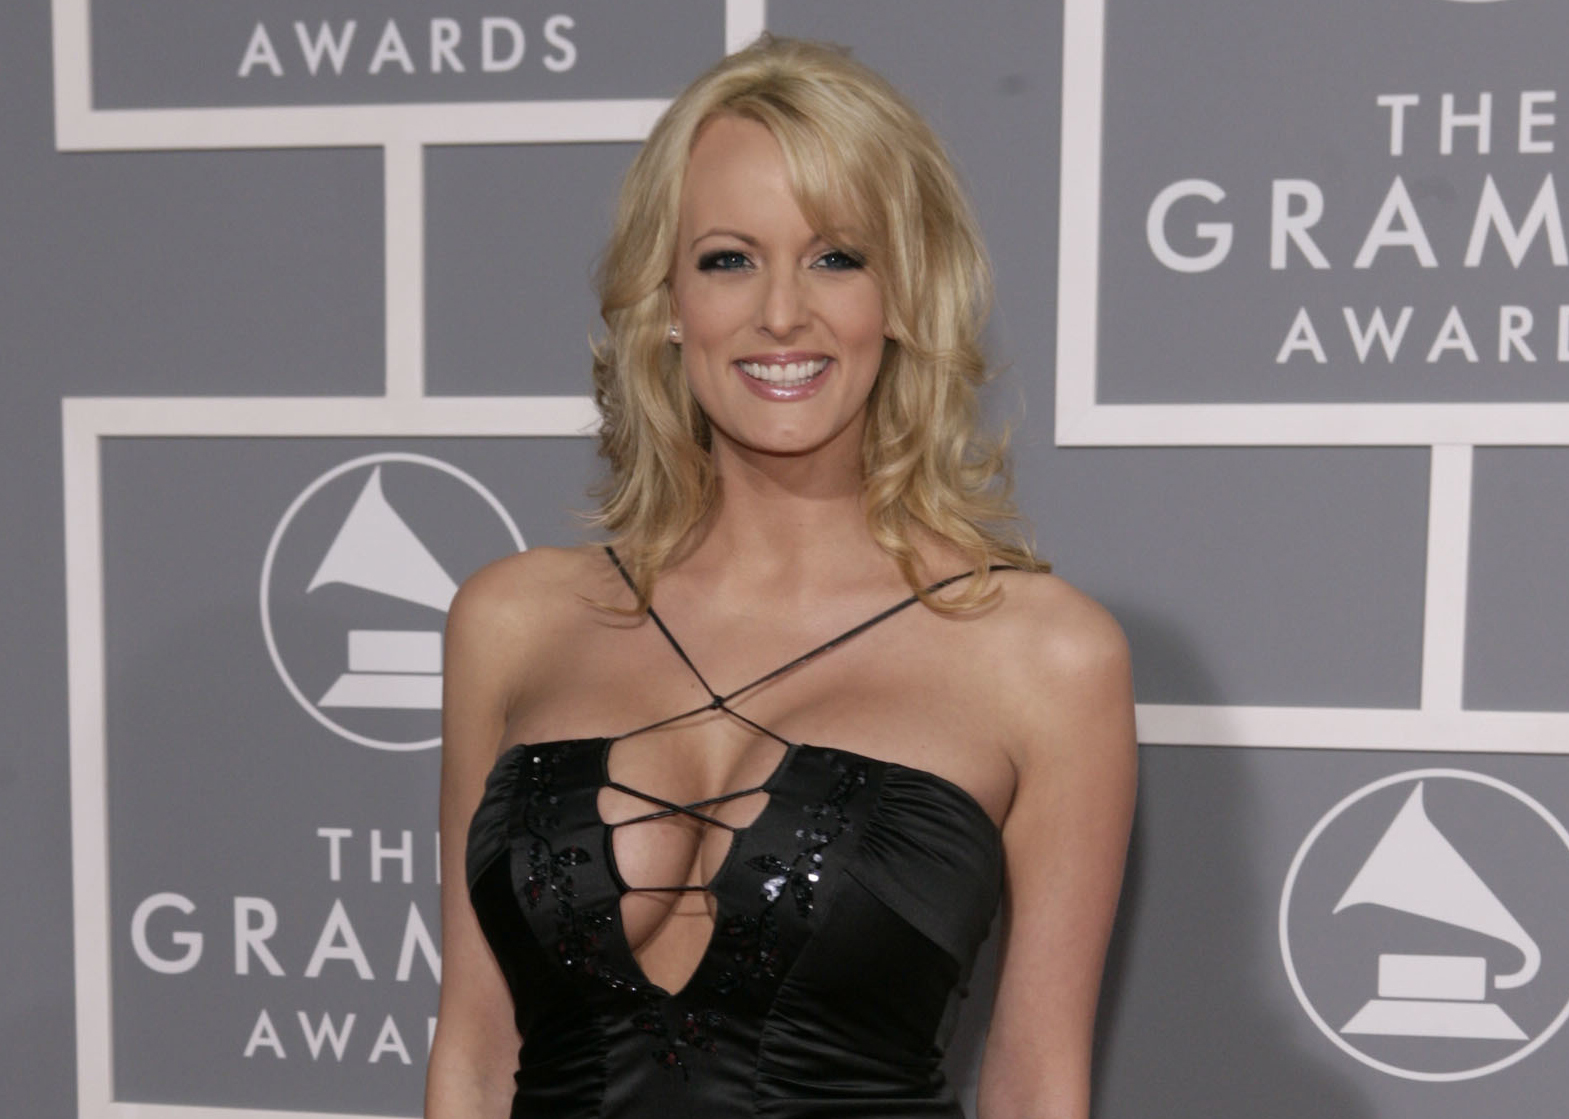 Stormy Daniels, porn star, says Trump affair never happened